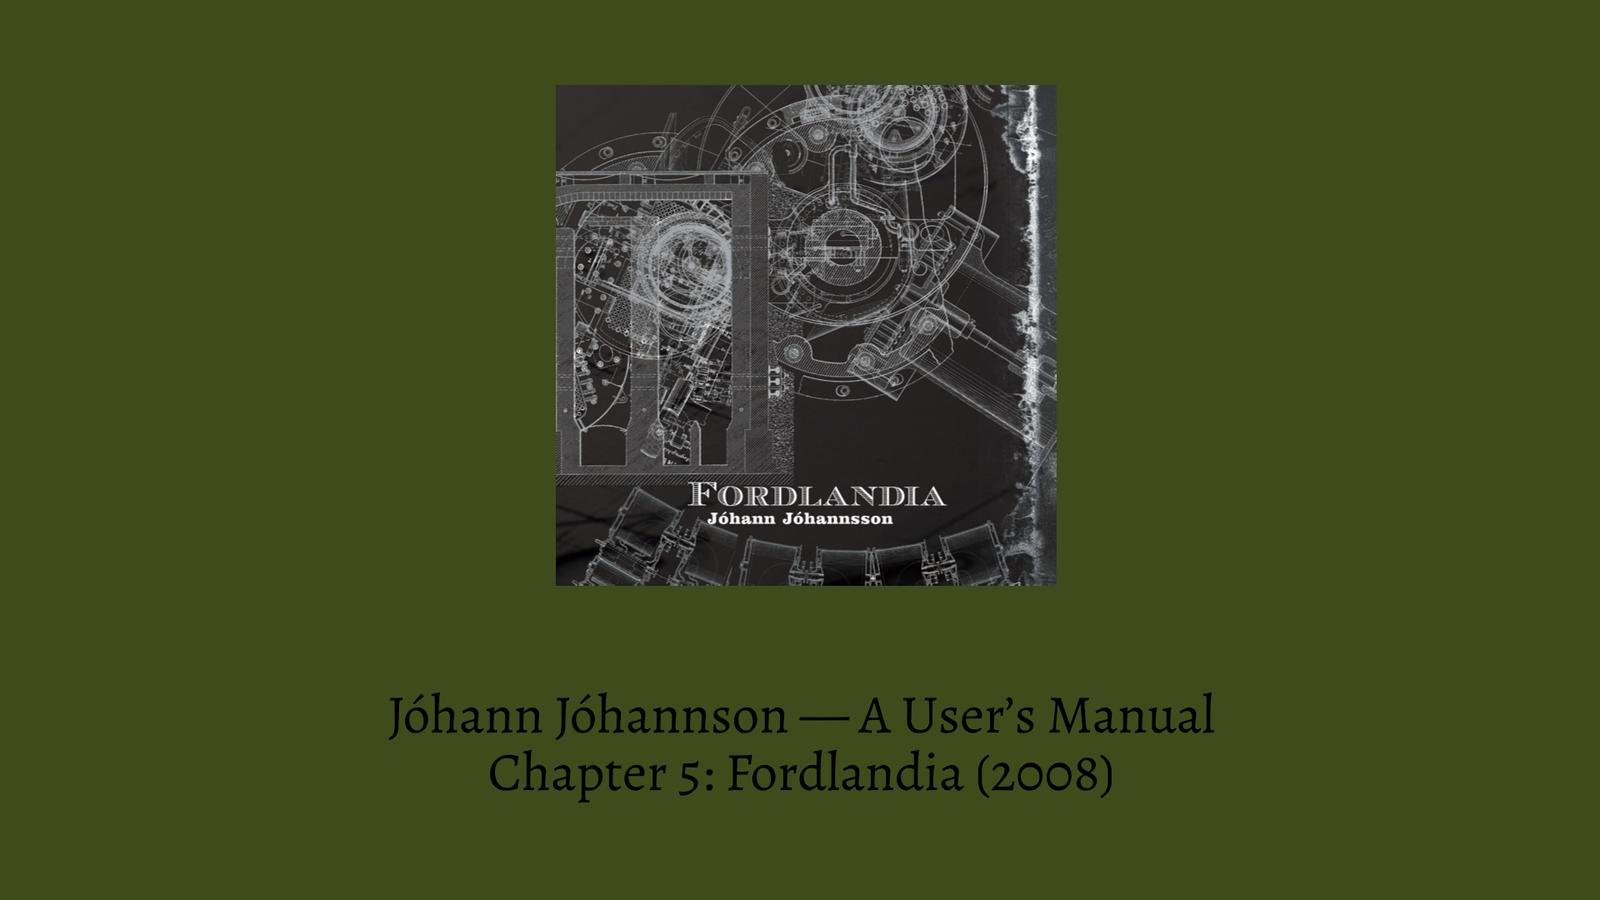 Johannsson A Users Manual Fordlandia